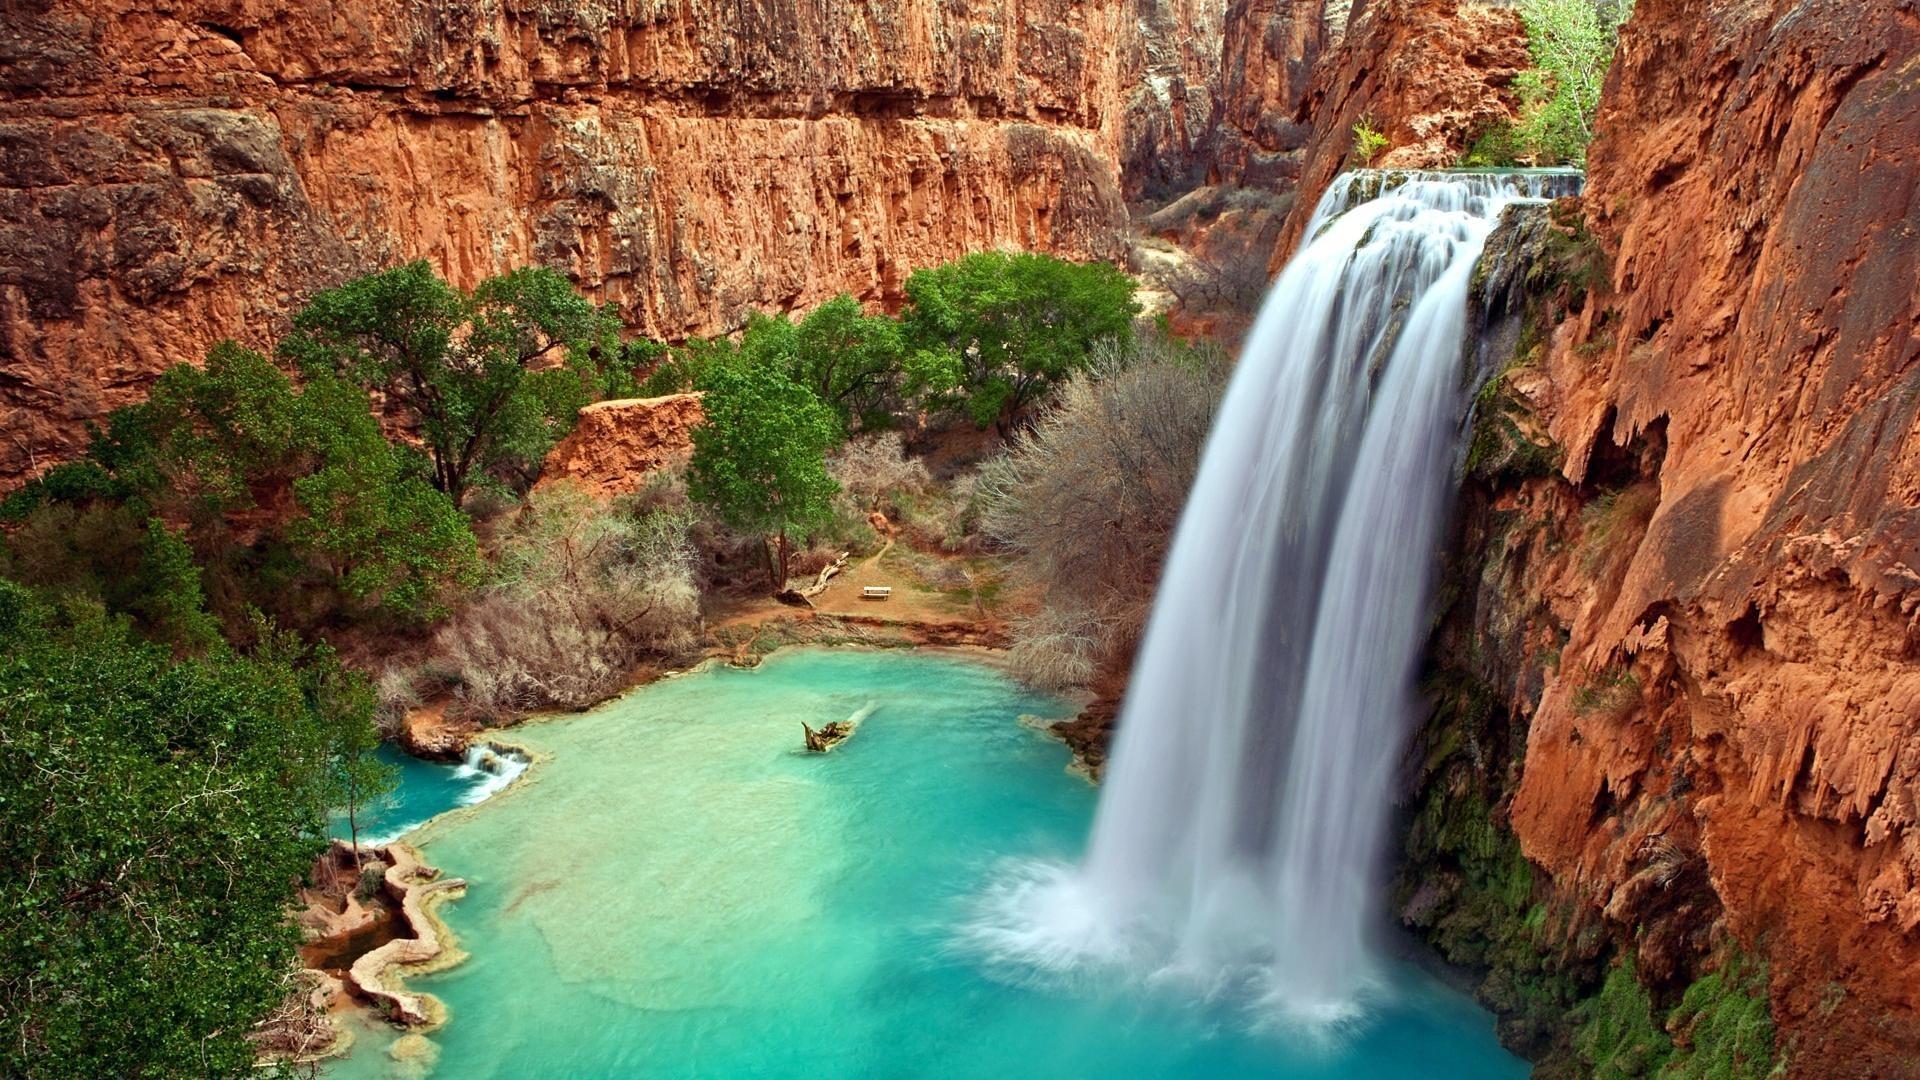 Waterfall hd image